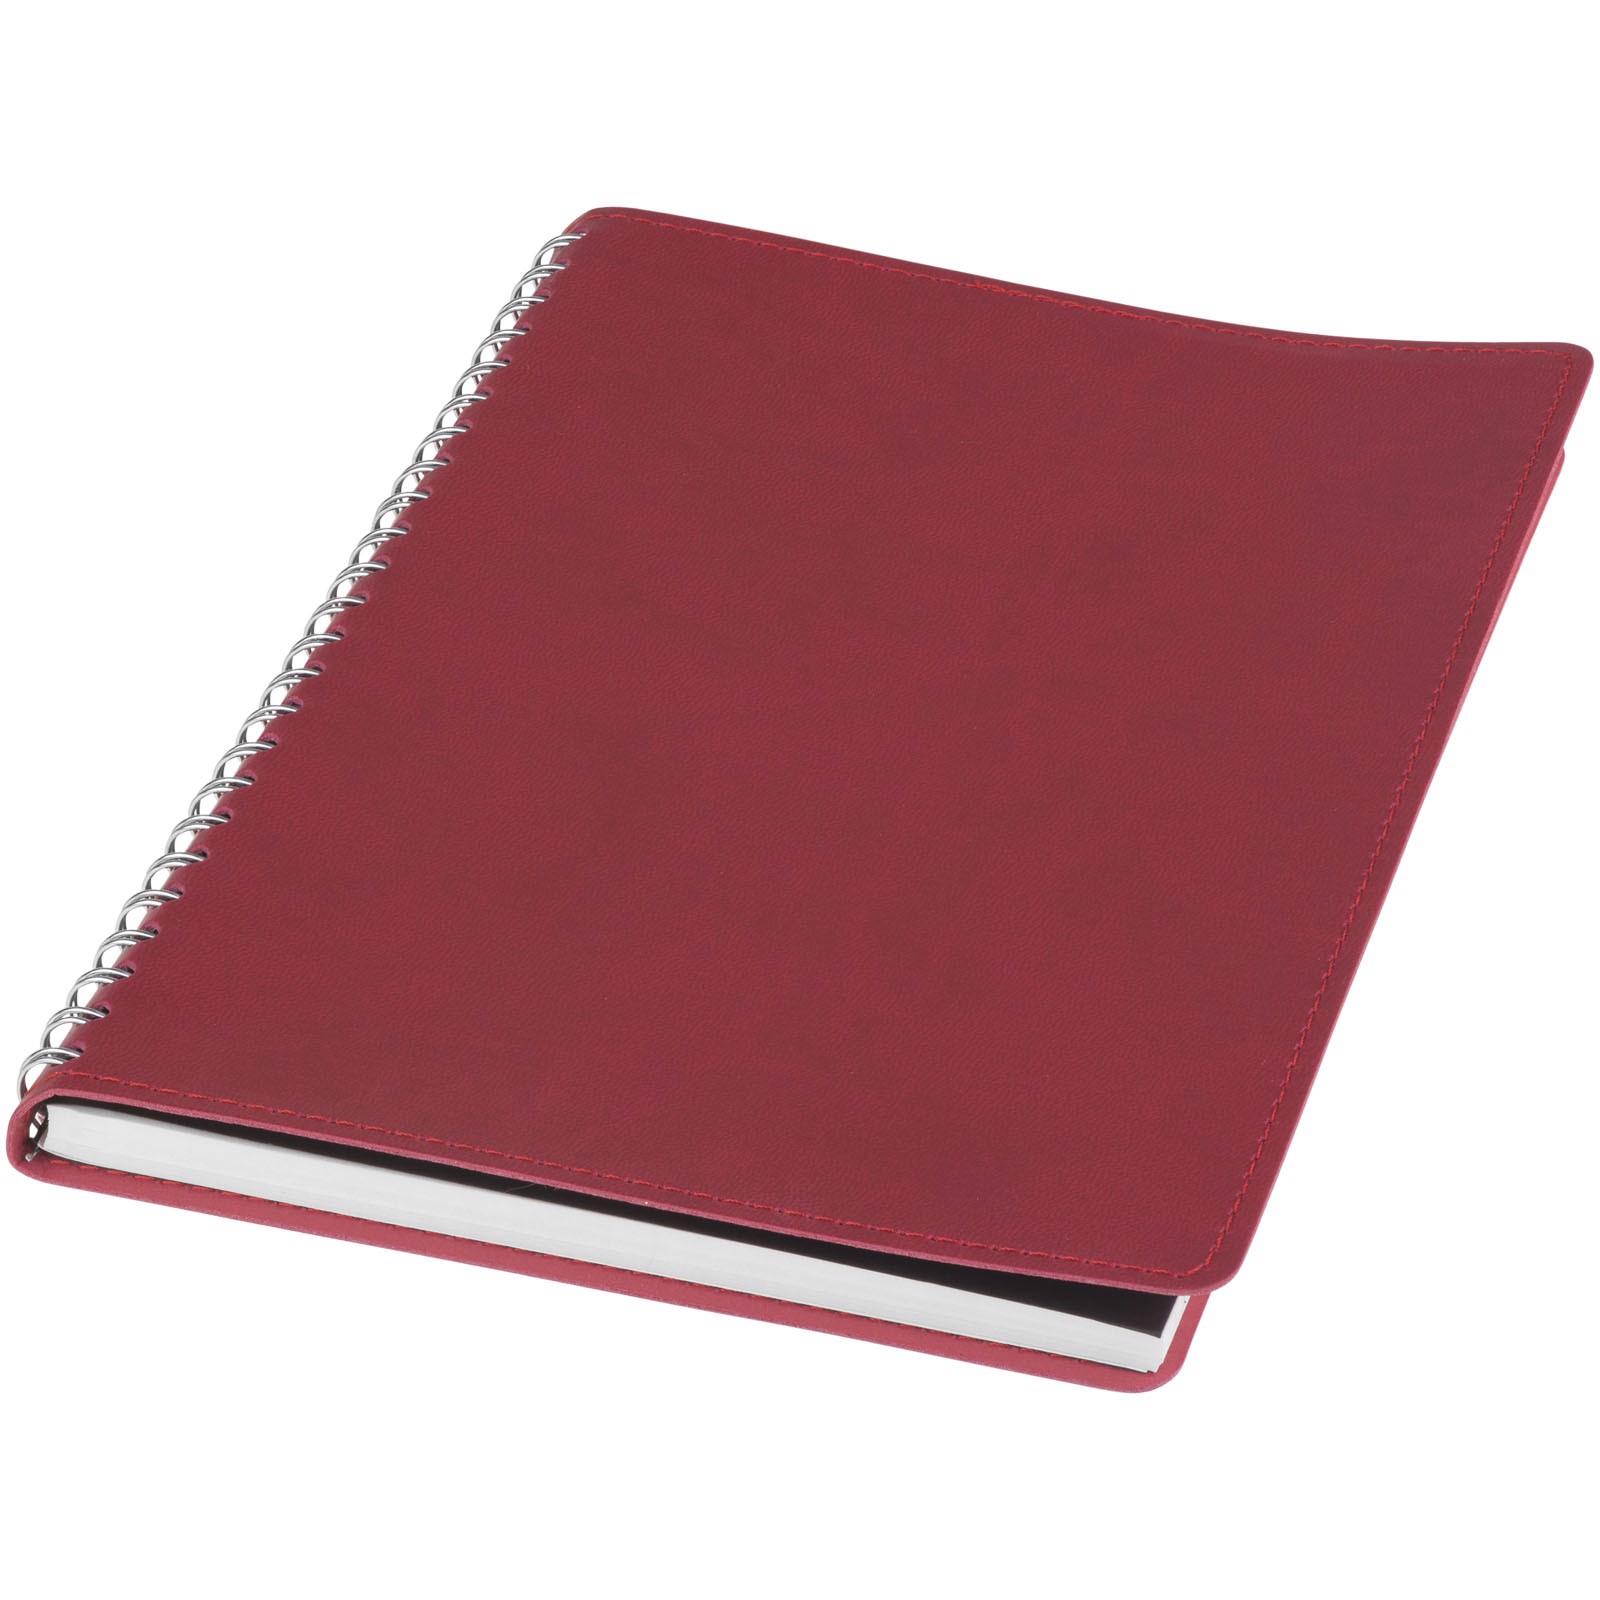 Brinc A5 soft cover notebook